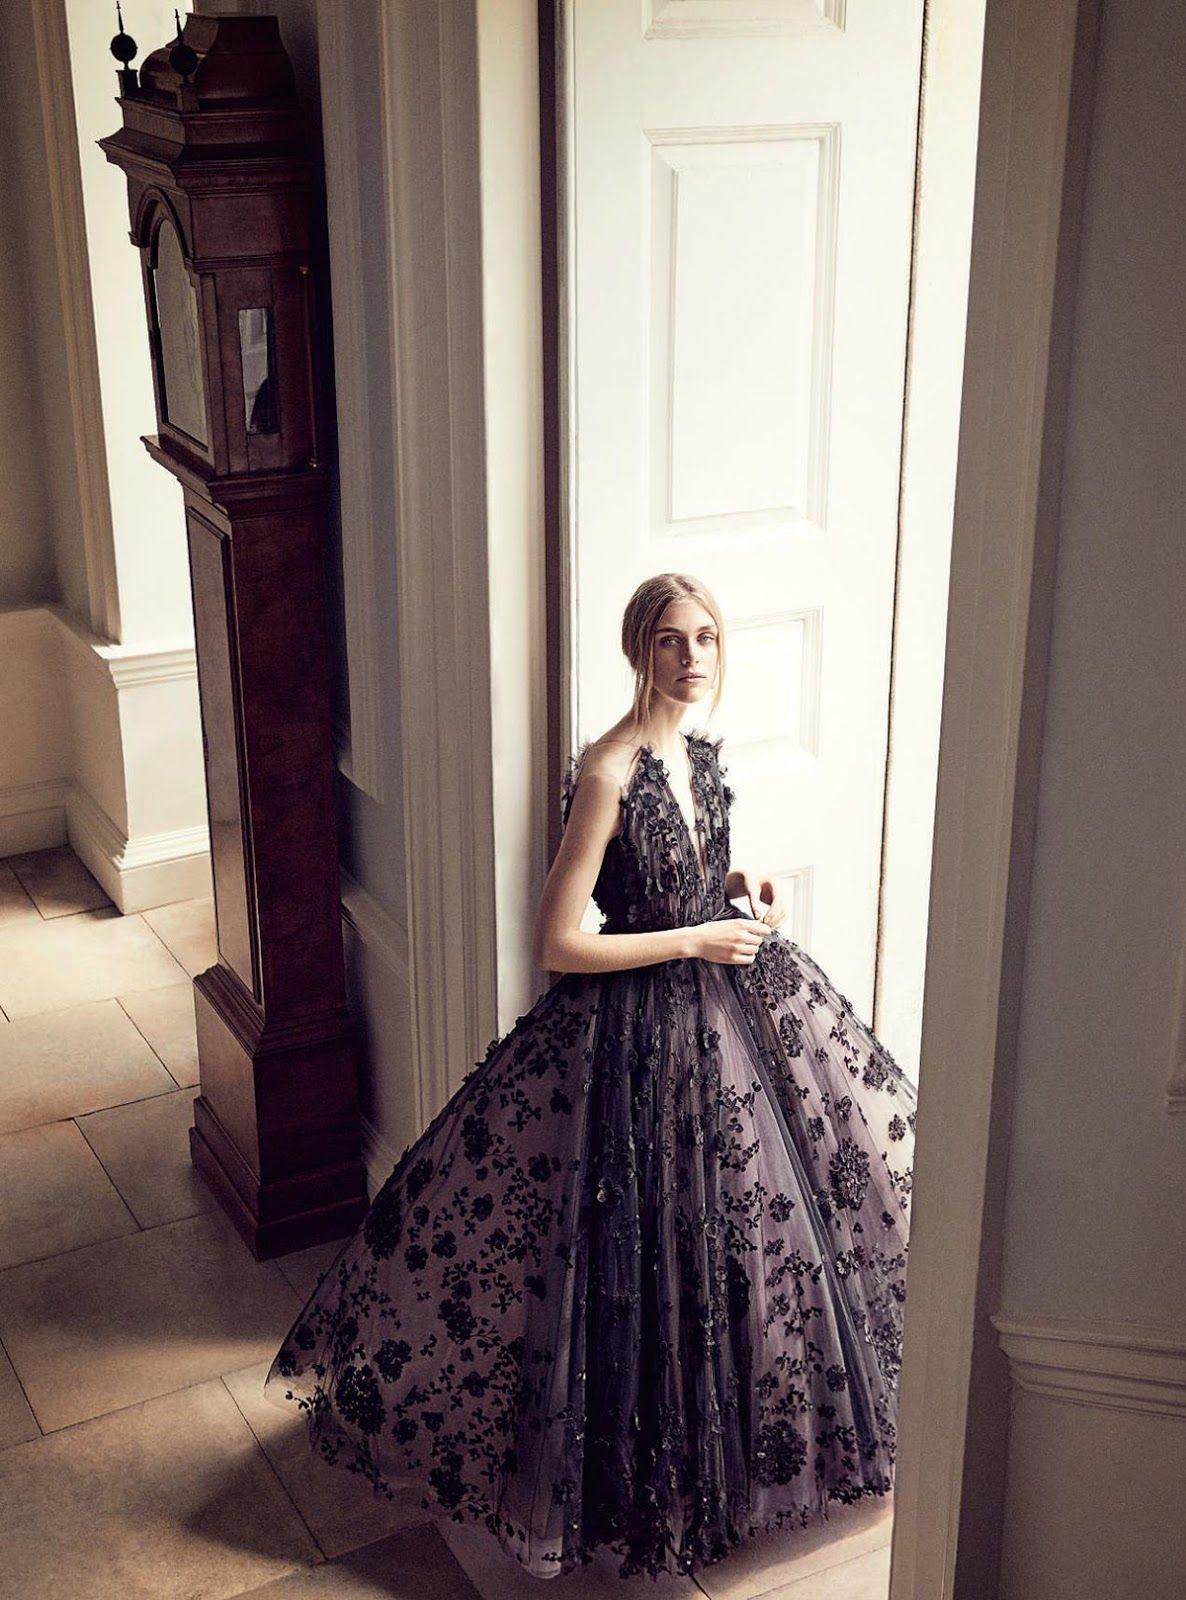 5098520028f5 Hedvig Palm Is Lensed By Richard Phibbs In  A Regency Romance  For Harper s  Bazaar UK December 2017